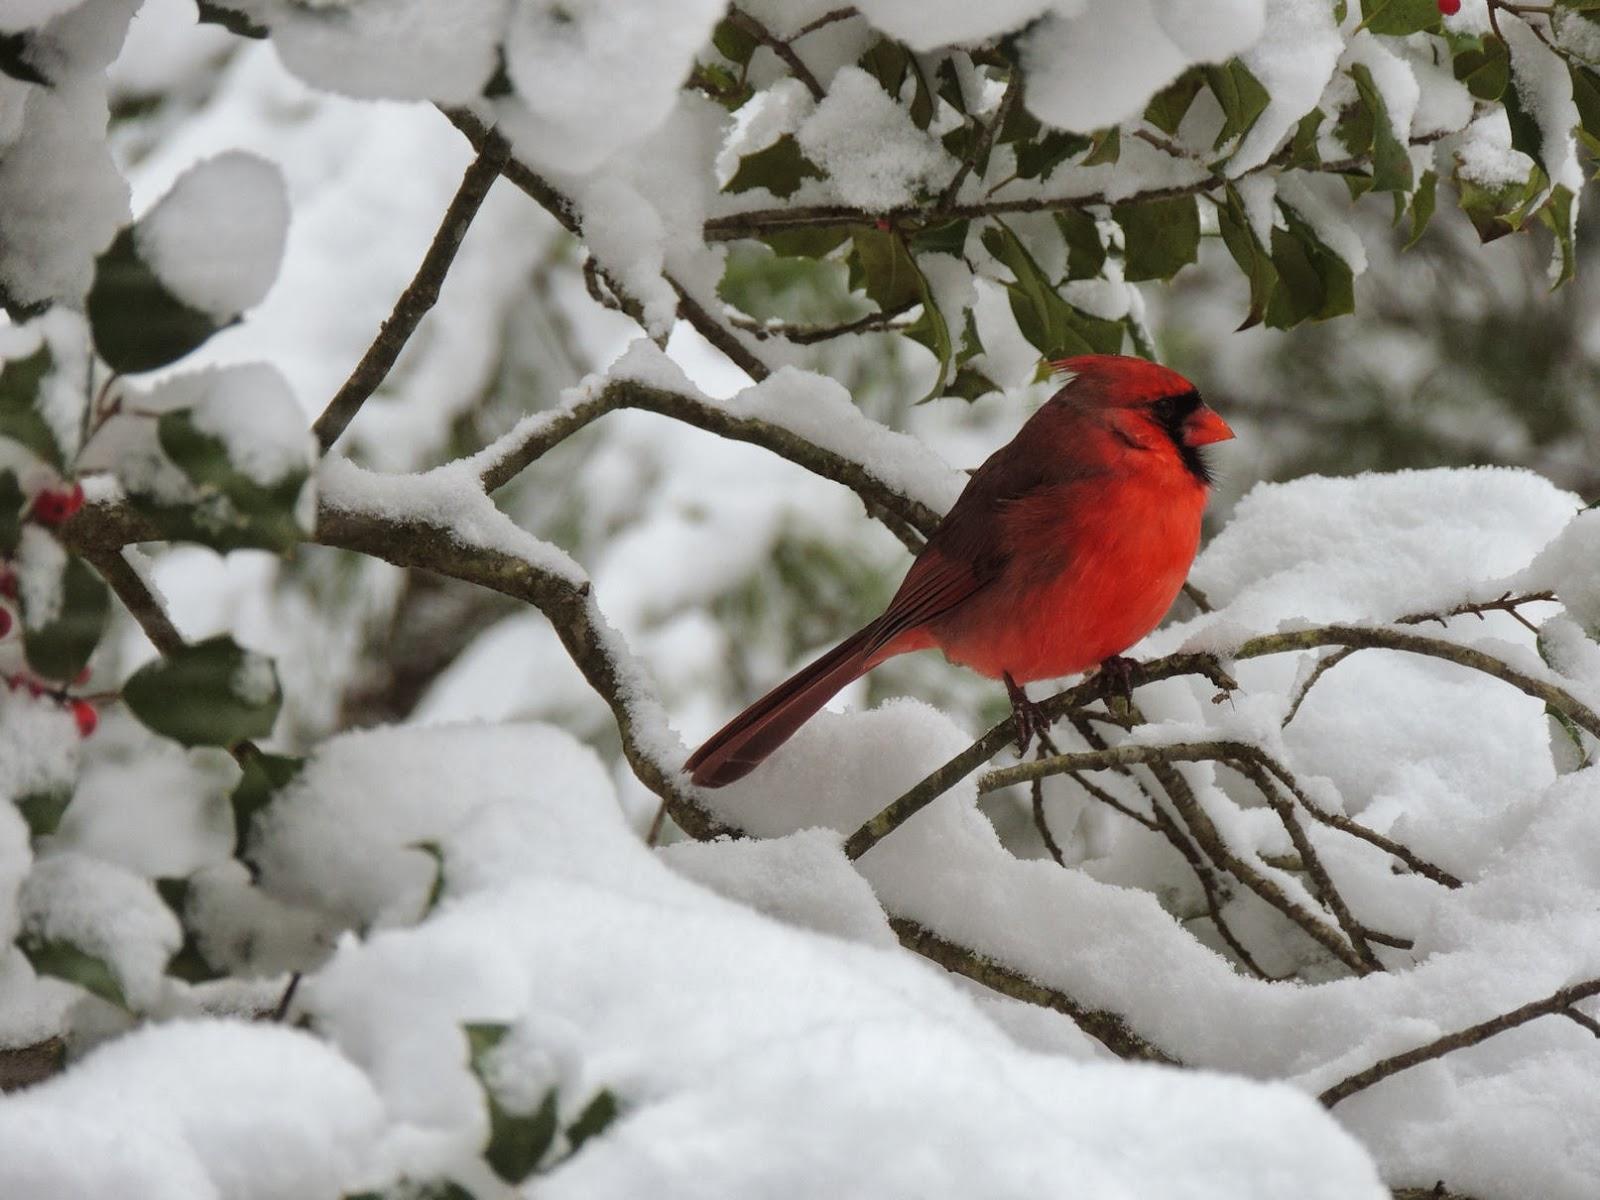 Cardinals in snow wallpaper wallpapersafari - Winter cardinal wallpaper ...